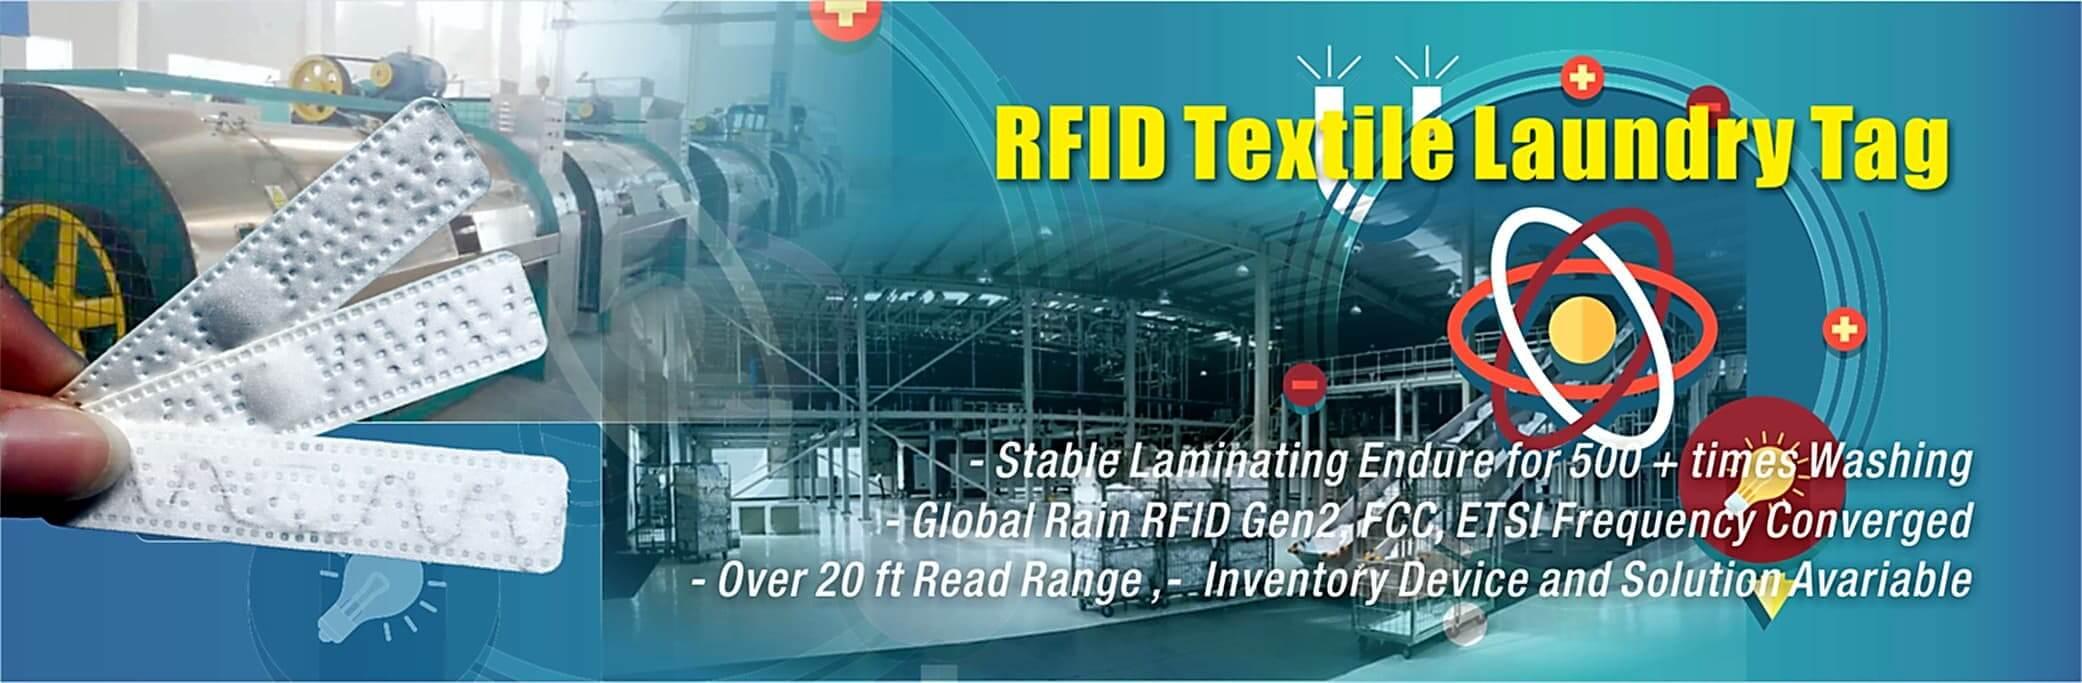 HUAYUAN Textile Linen RFID Laundry Tag